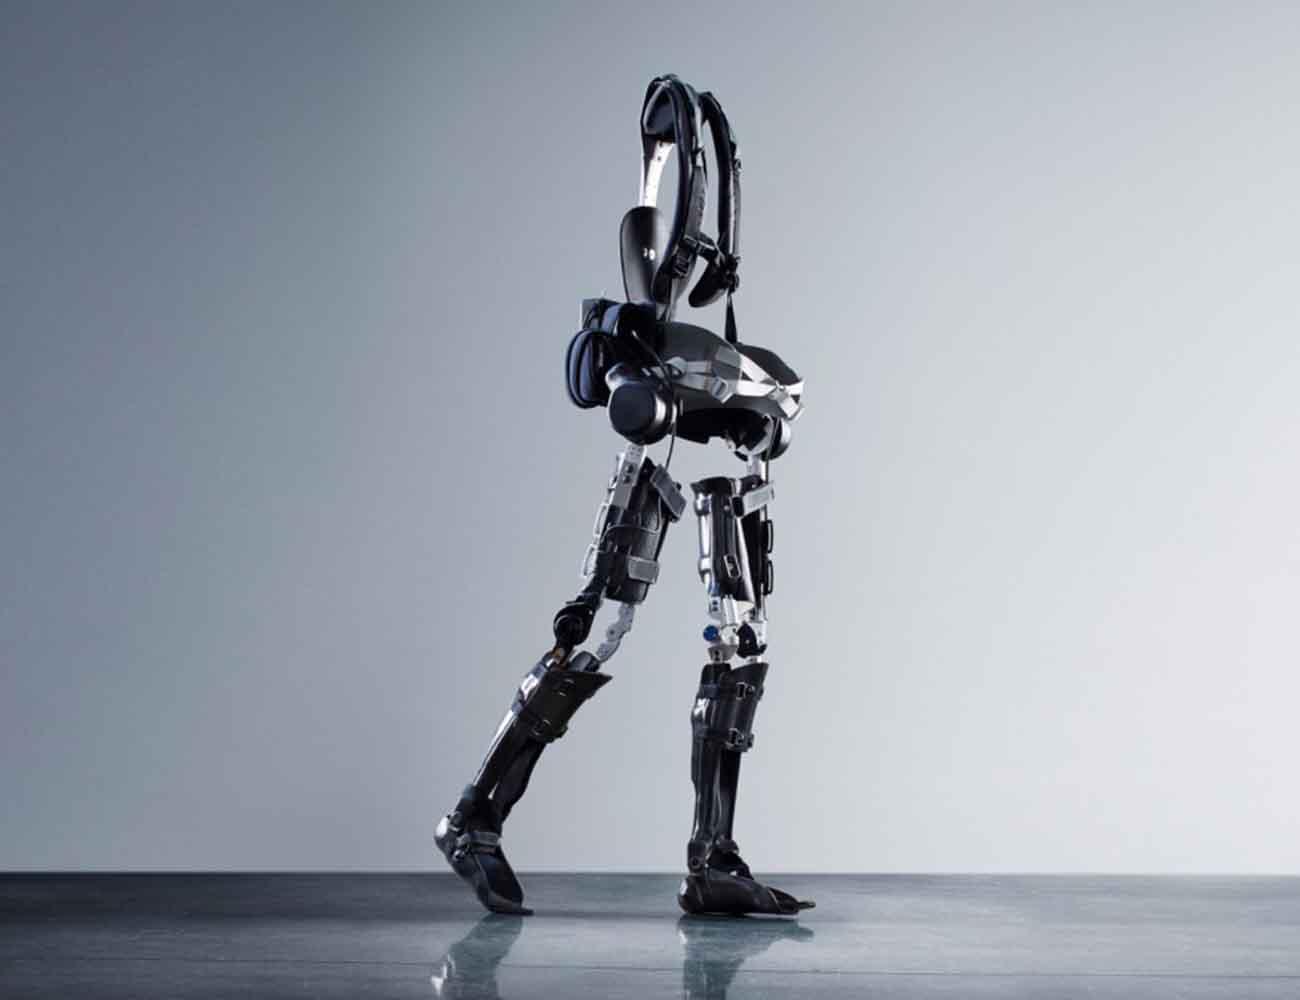 Phoenix – World's Most Advanced Exoskeleton